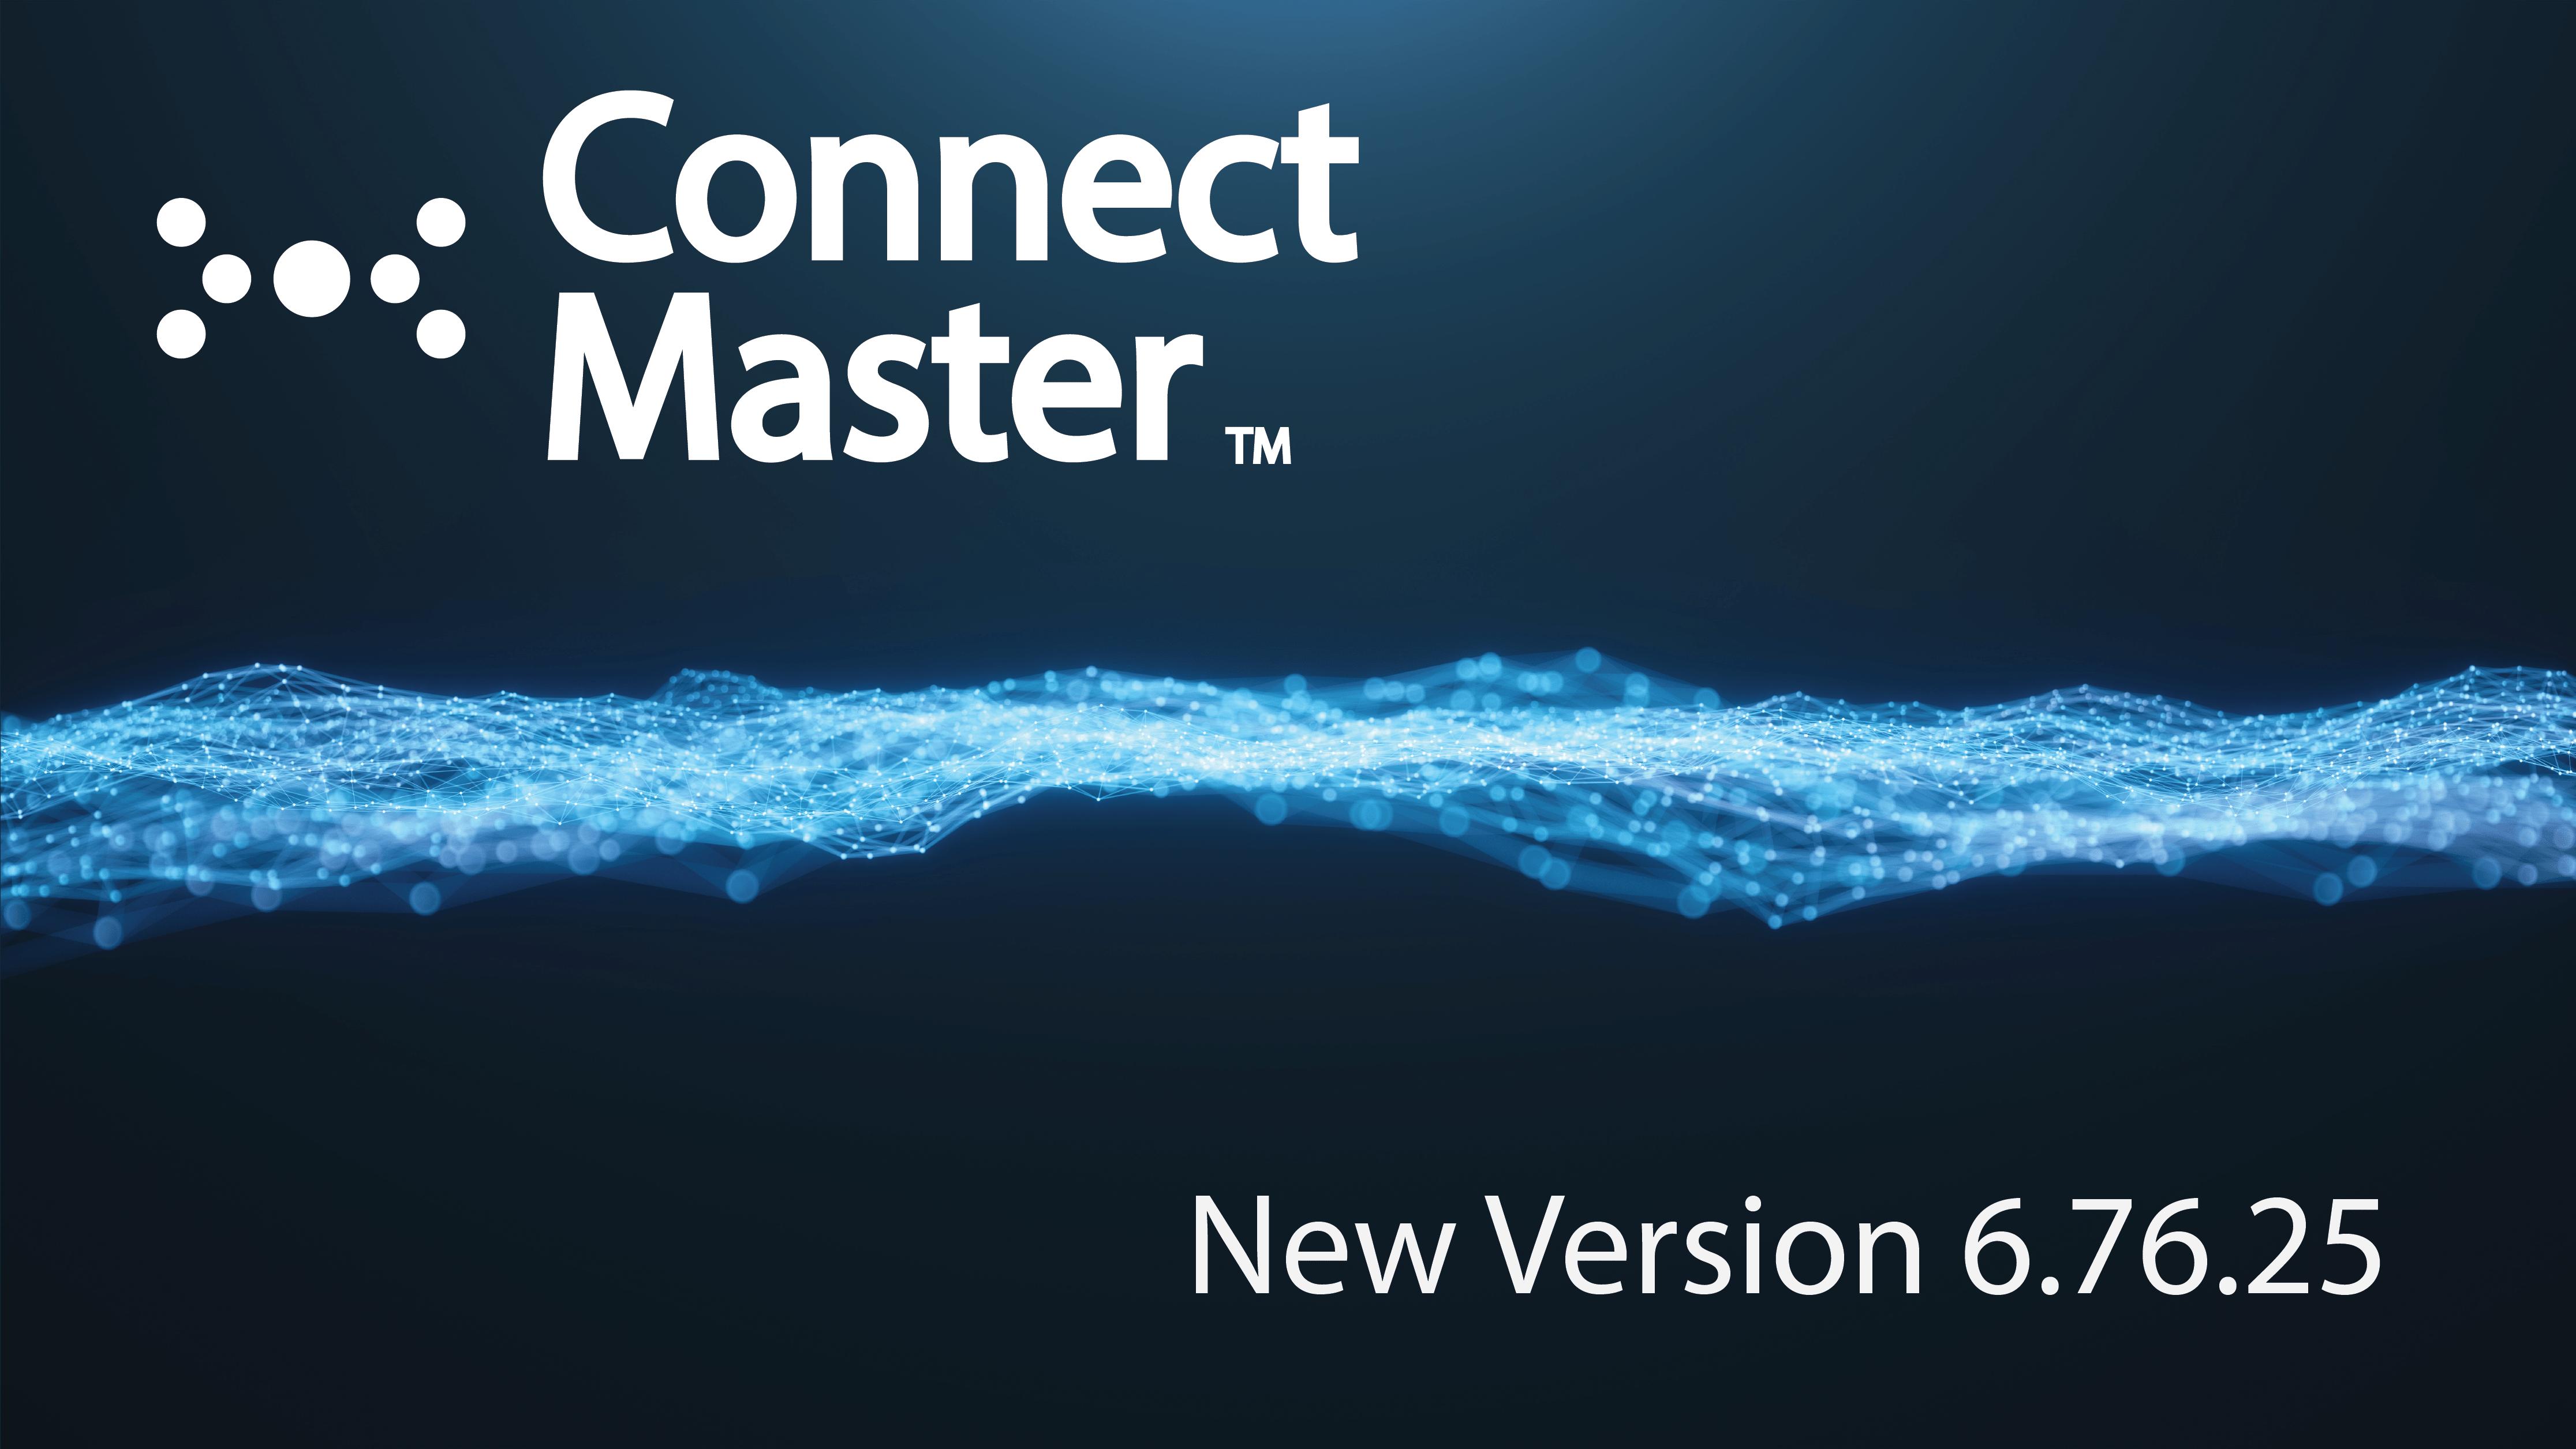 CM New Version_6.76.25